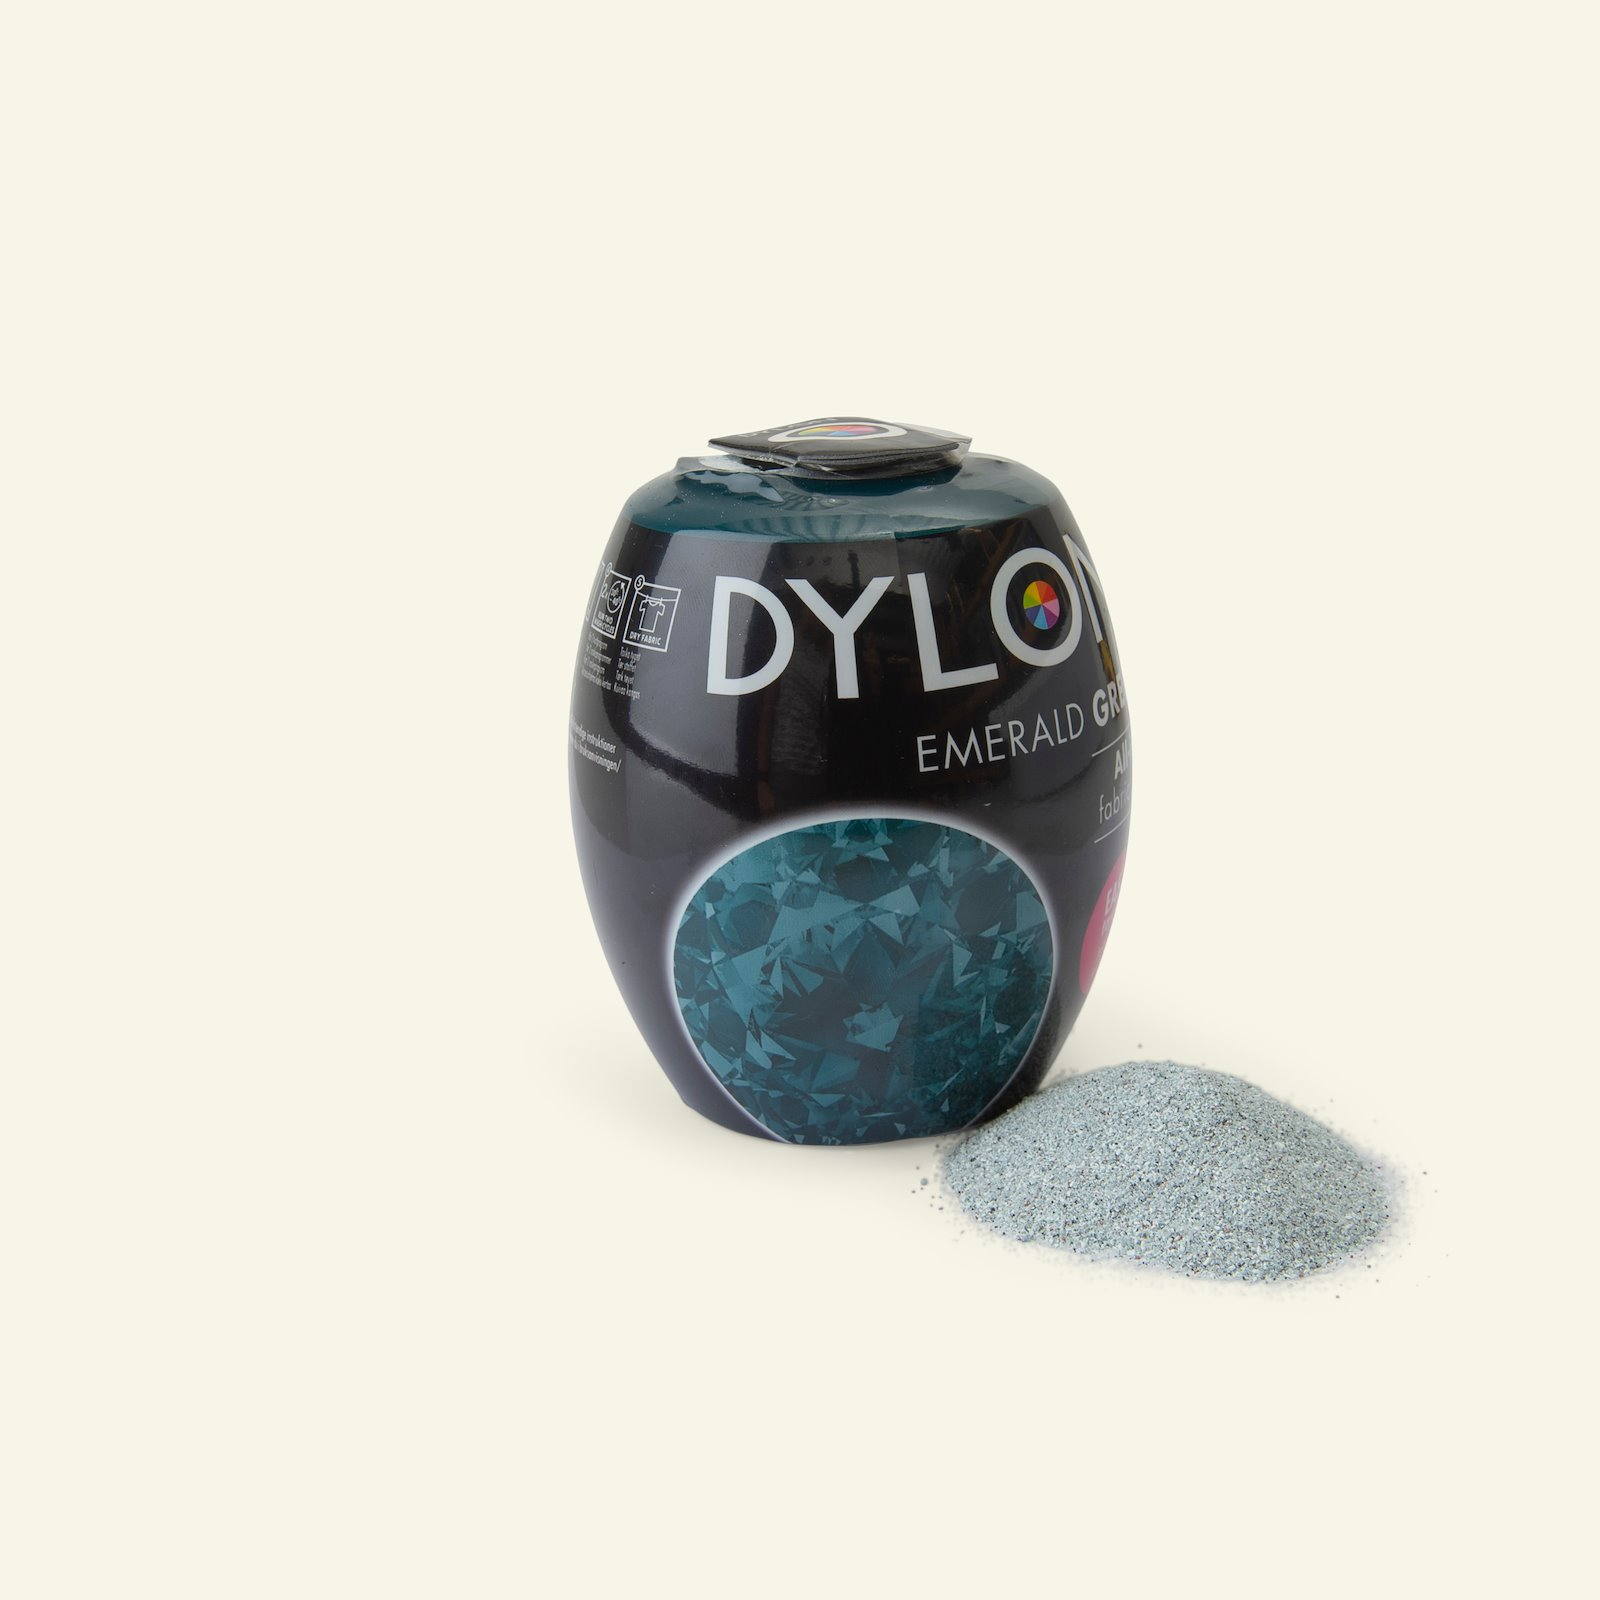 Dylon Maschinenfarbe, Grün 29700_pack